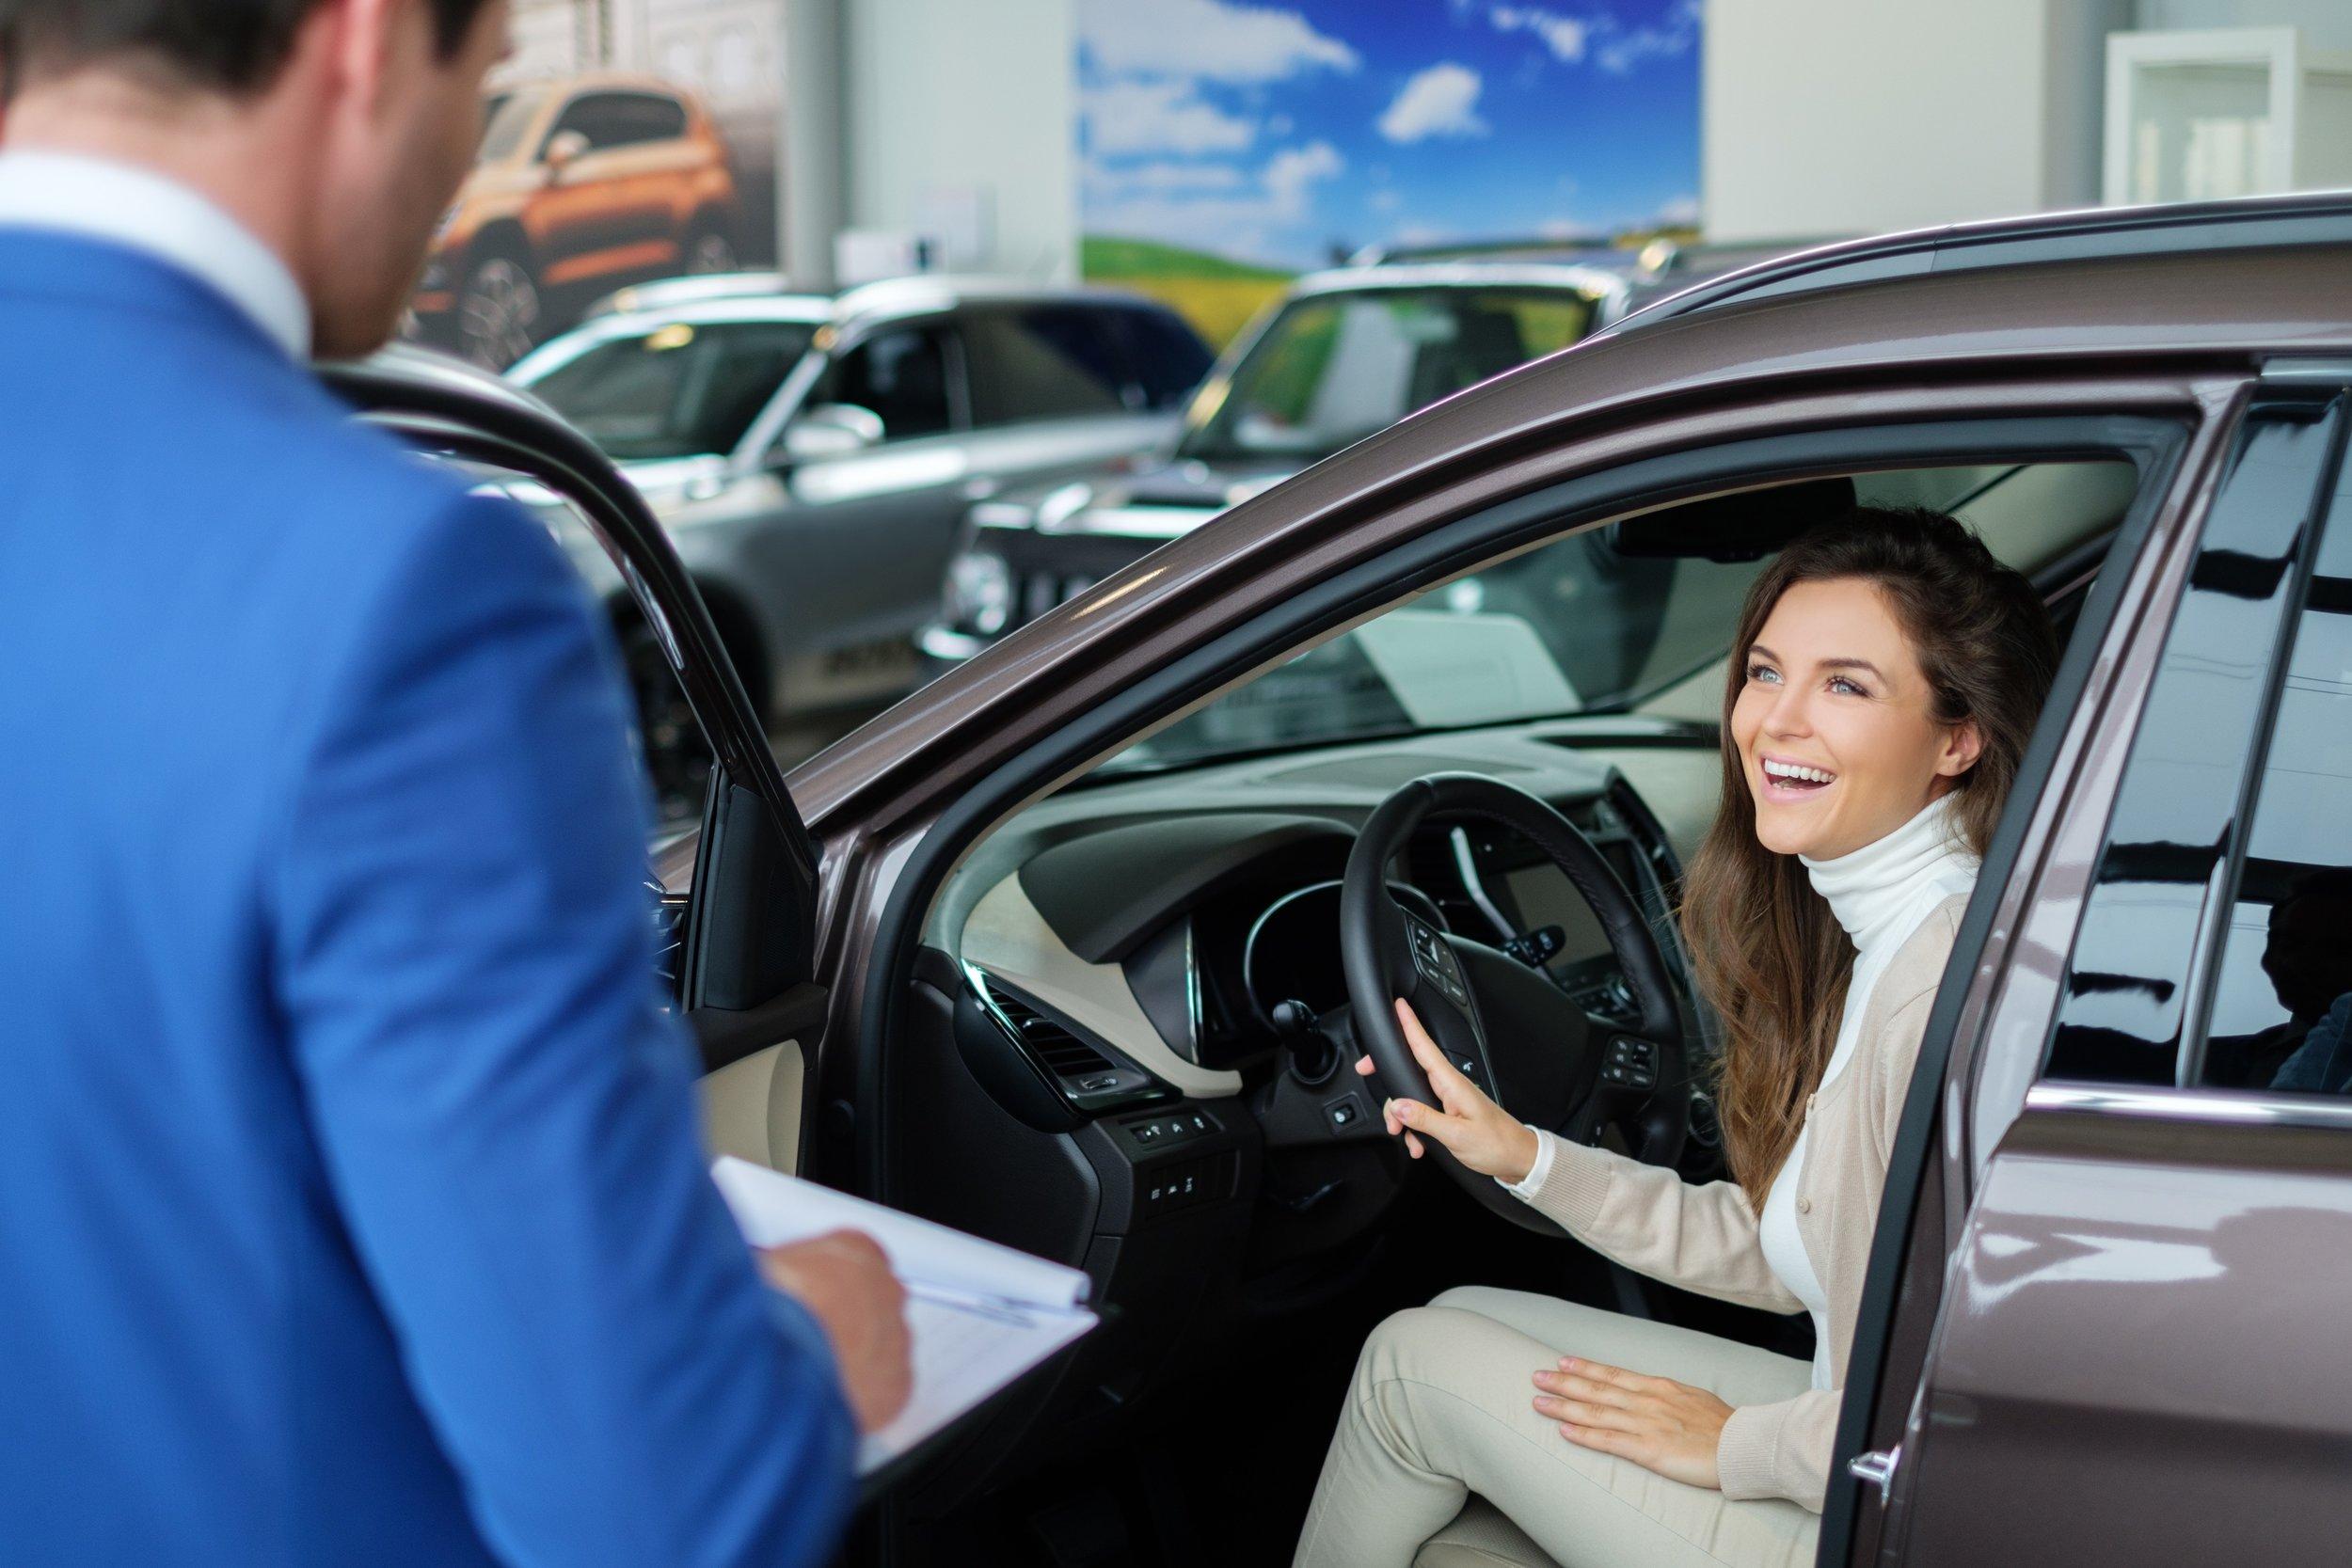 attractive-woman-in-car.jpg